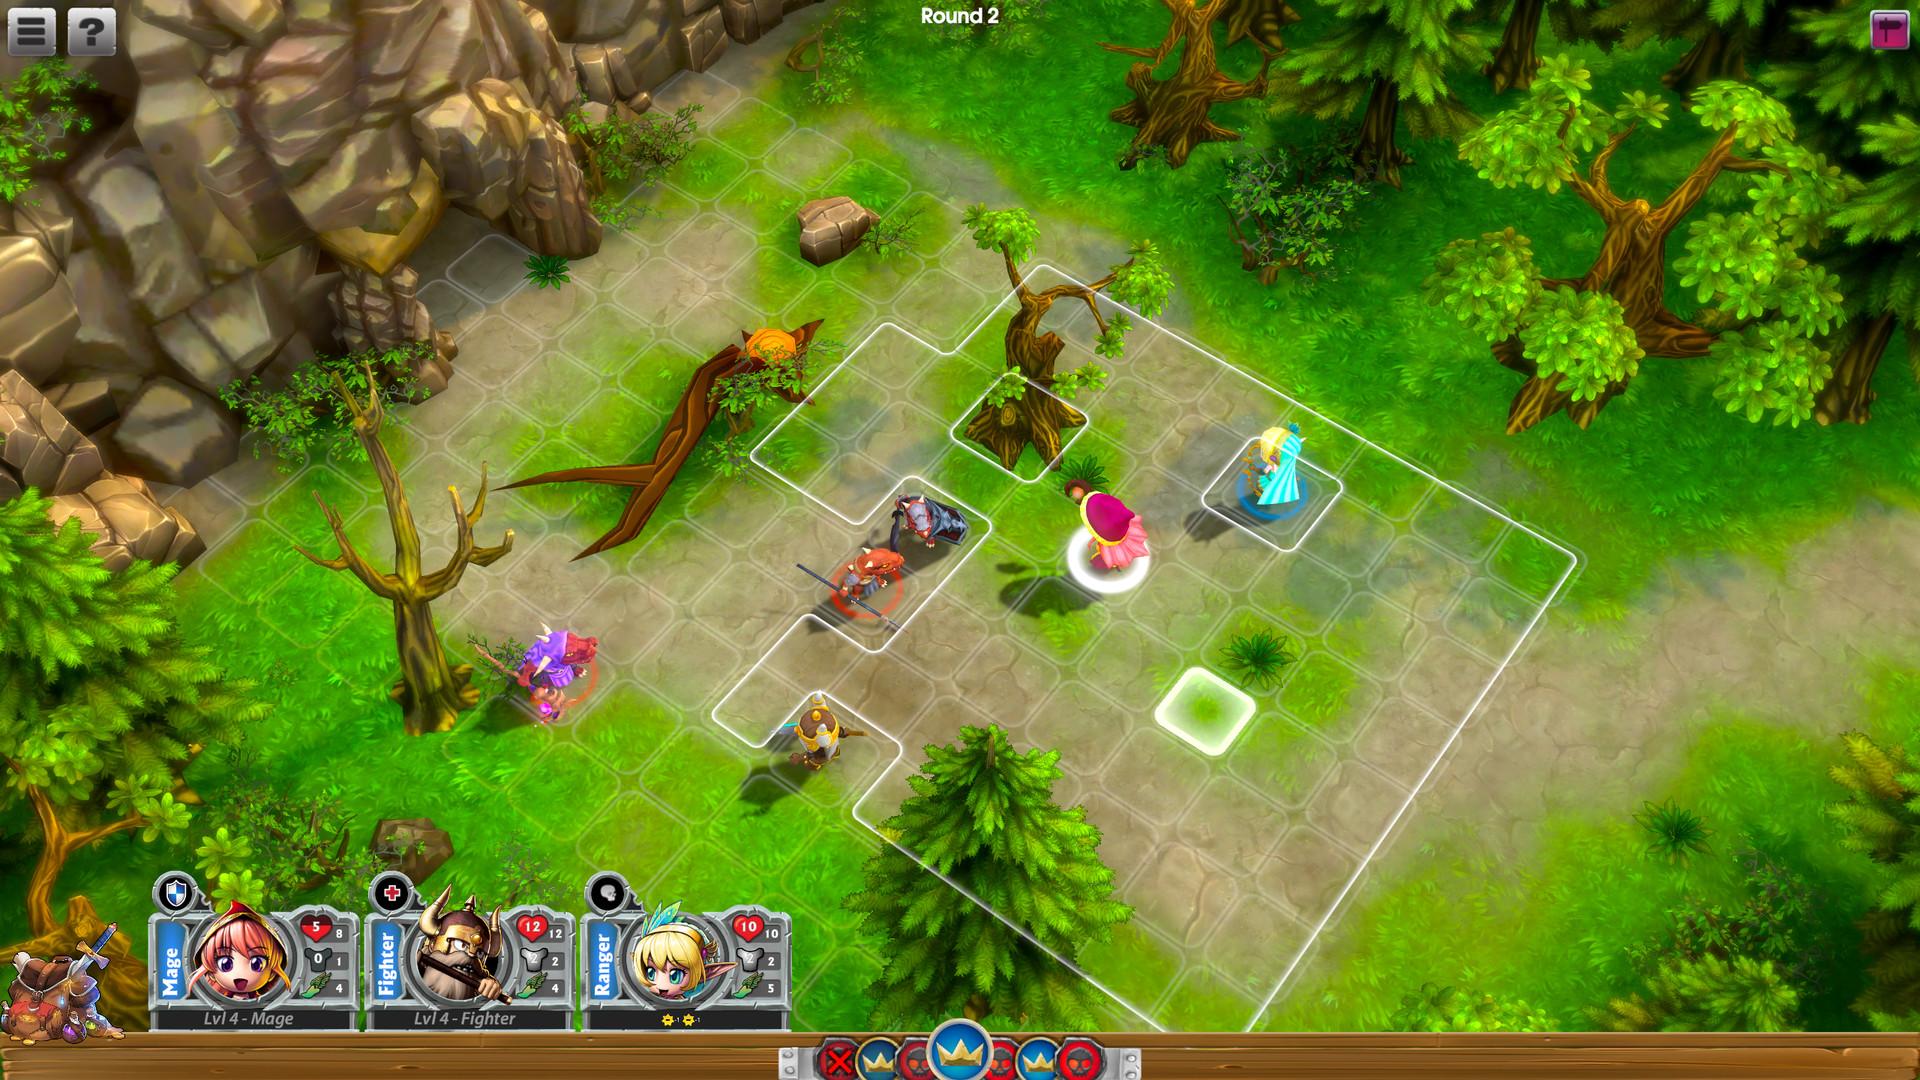 Super Dungeon Tactics Screenshot 2